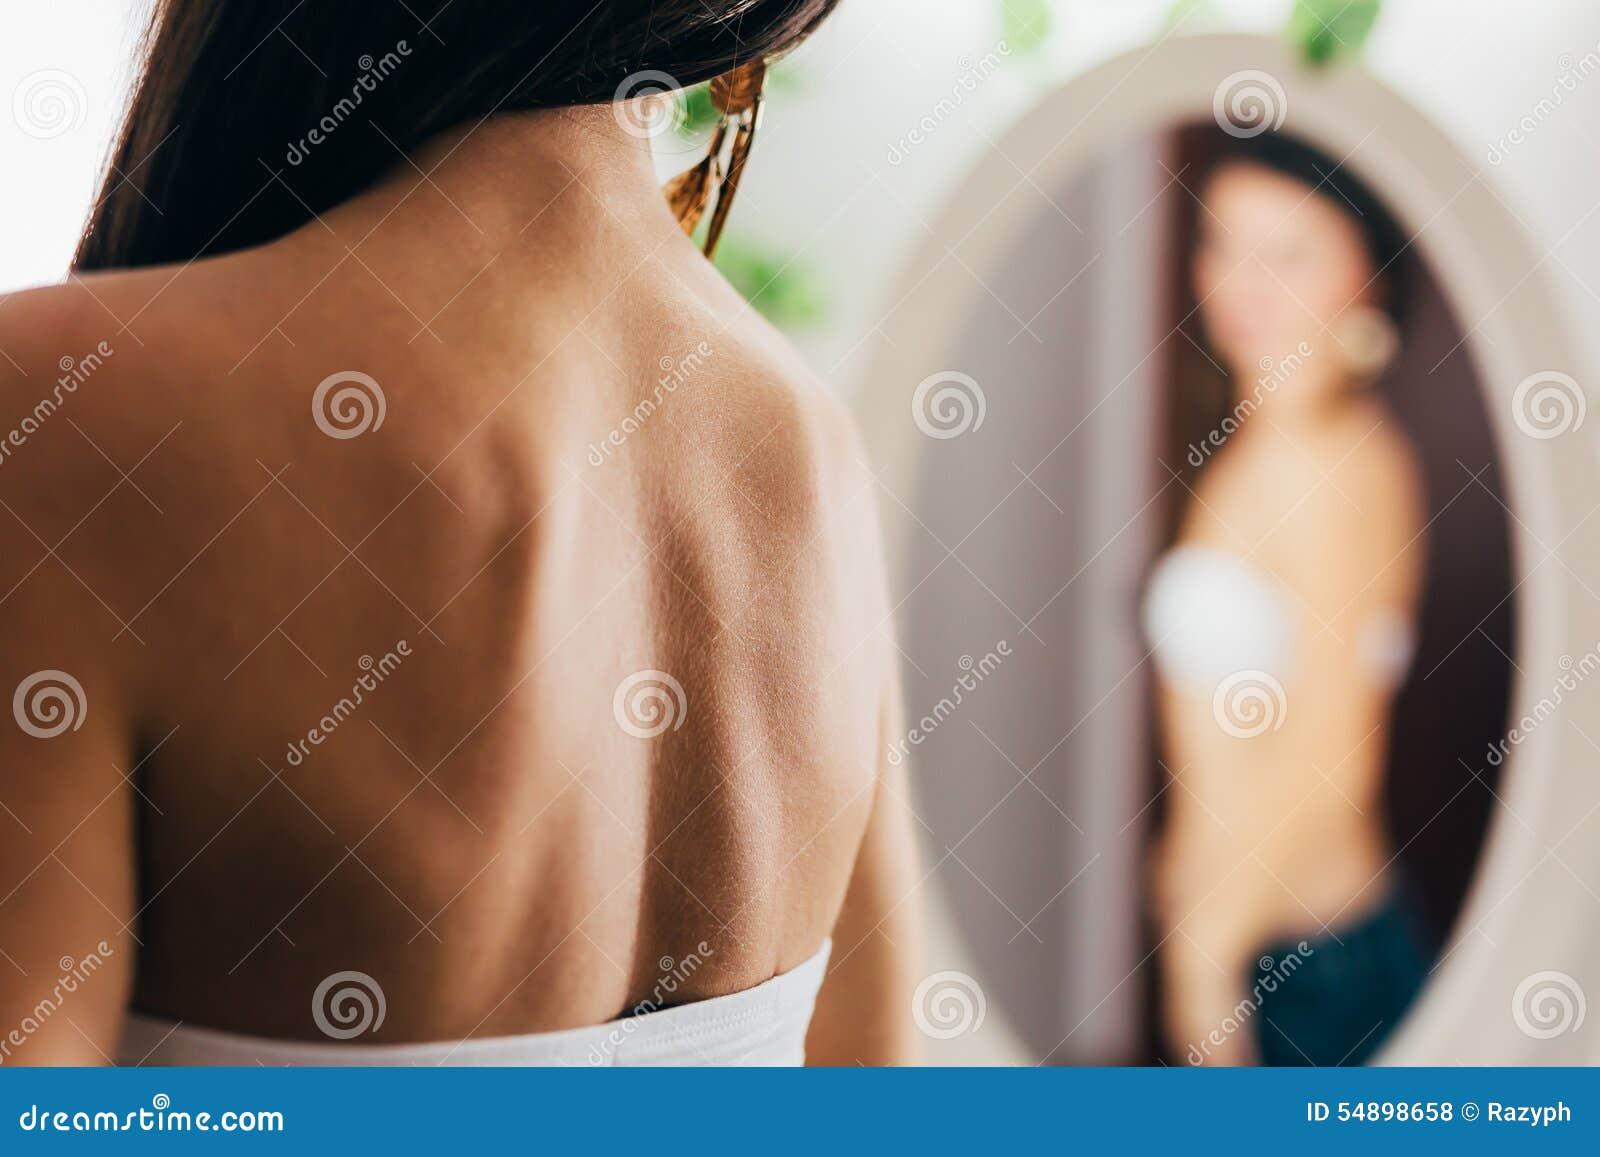 Back Ok A Woman Stock Photo. Image Of Back, Femininity